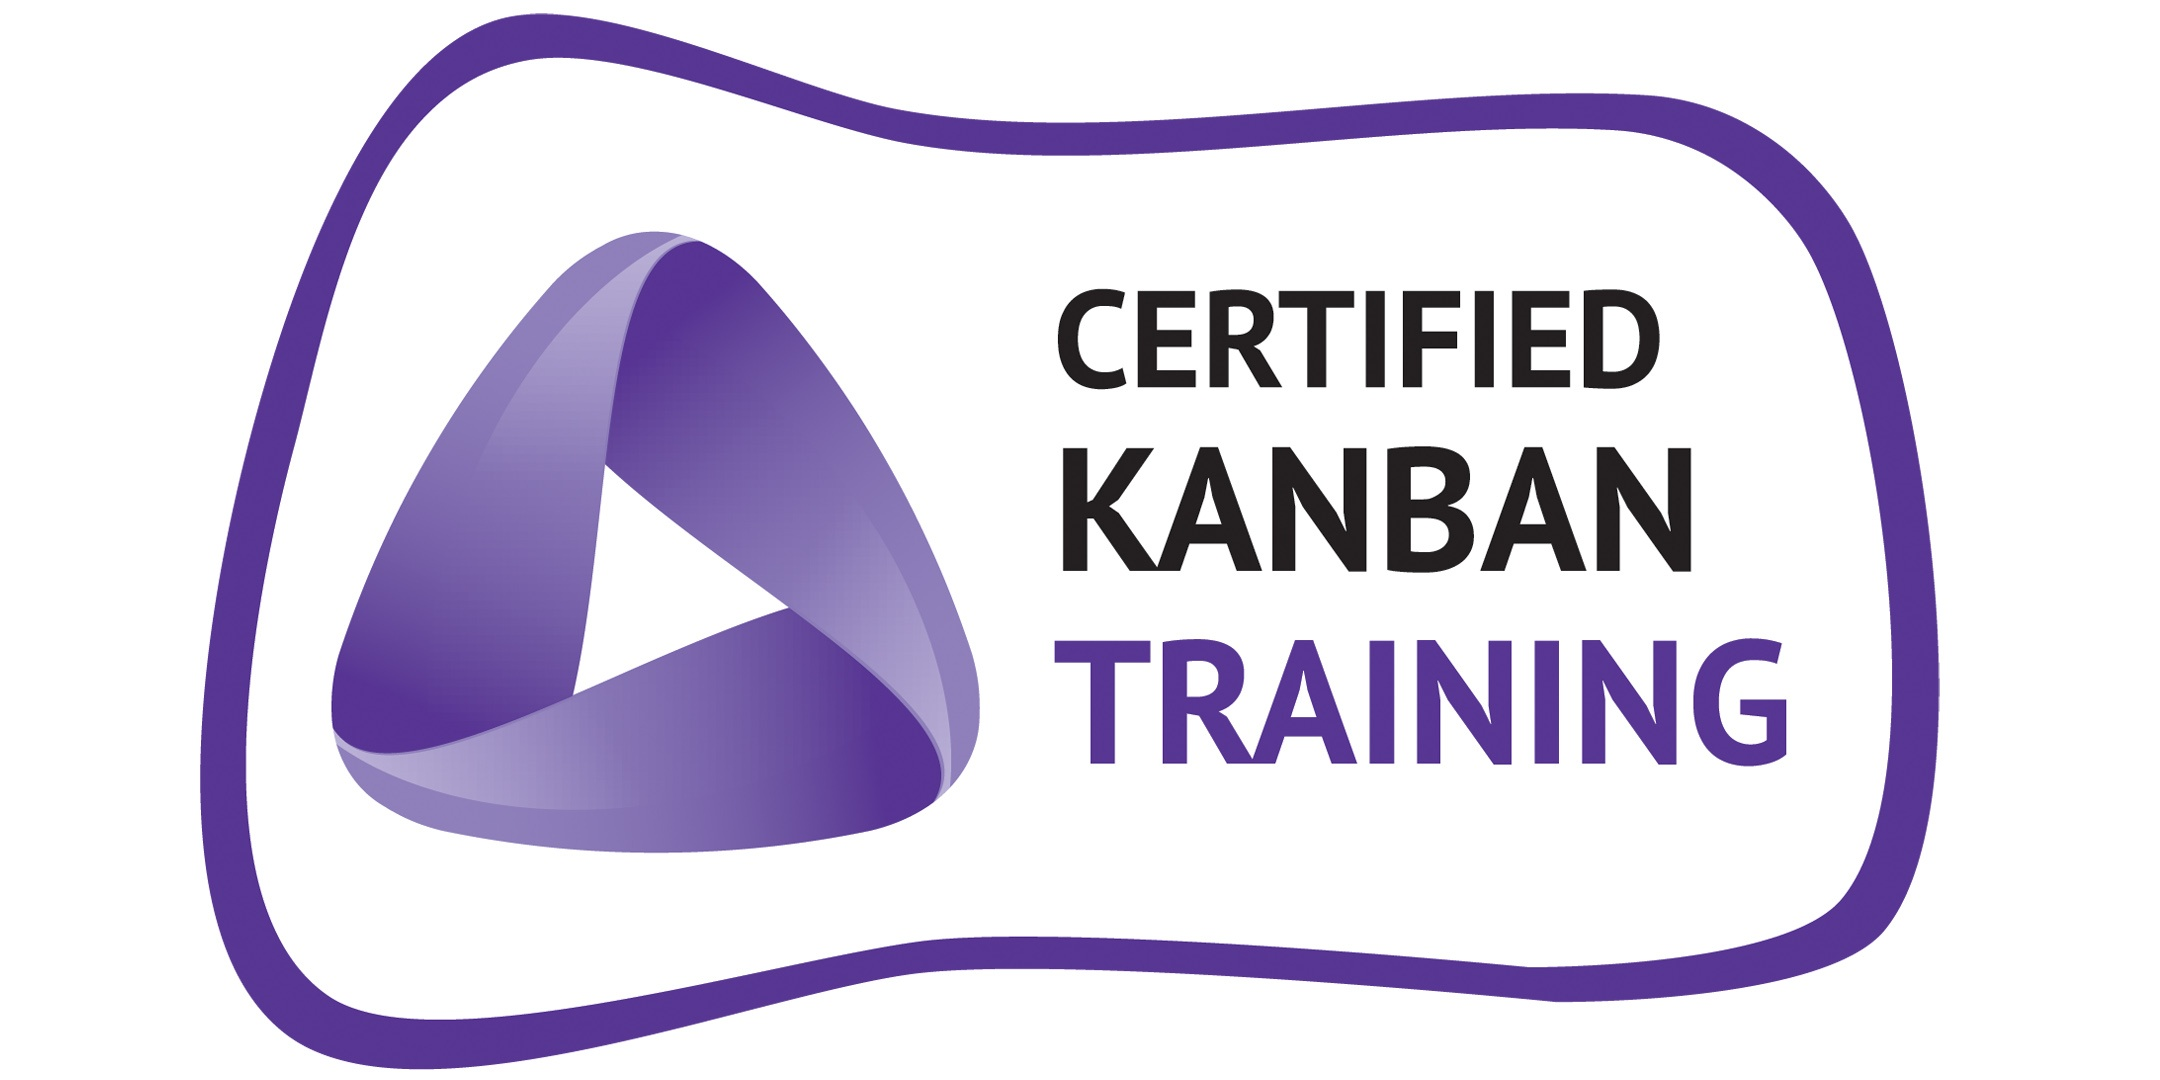 Kanban Team Foundation